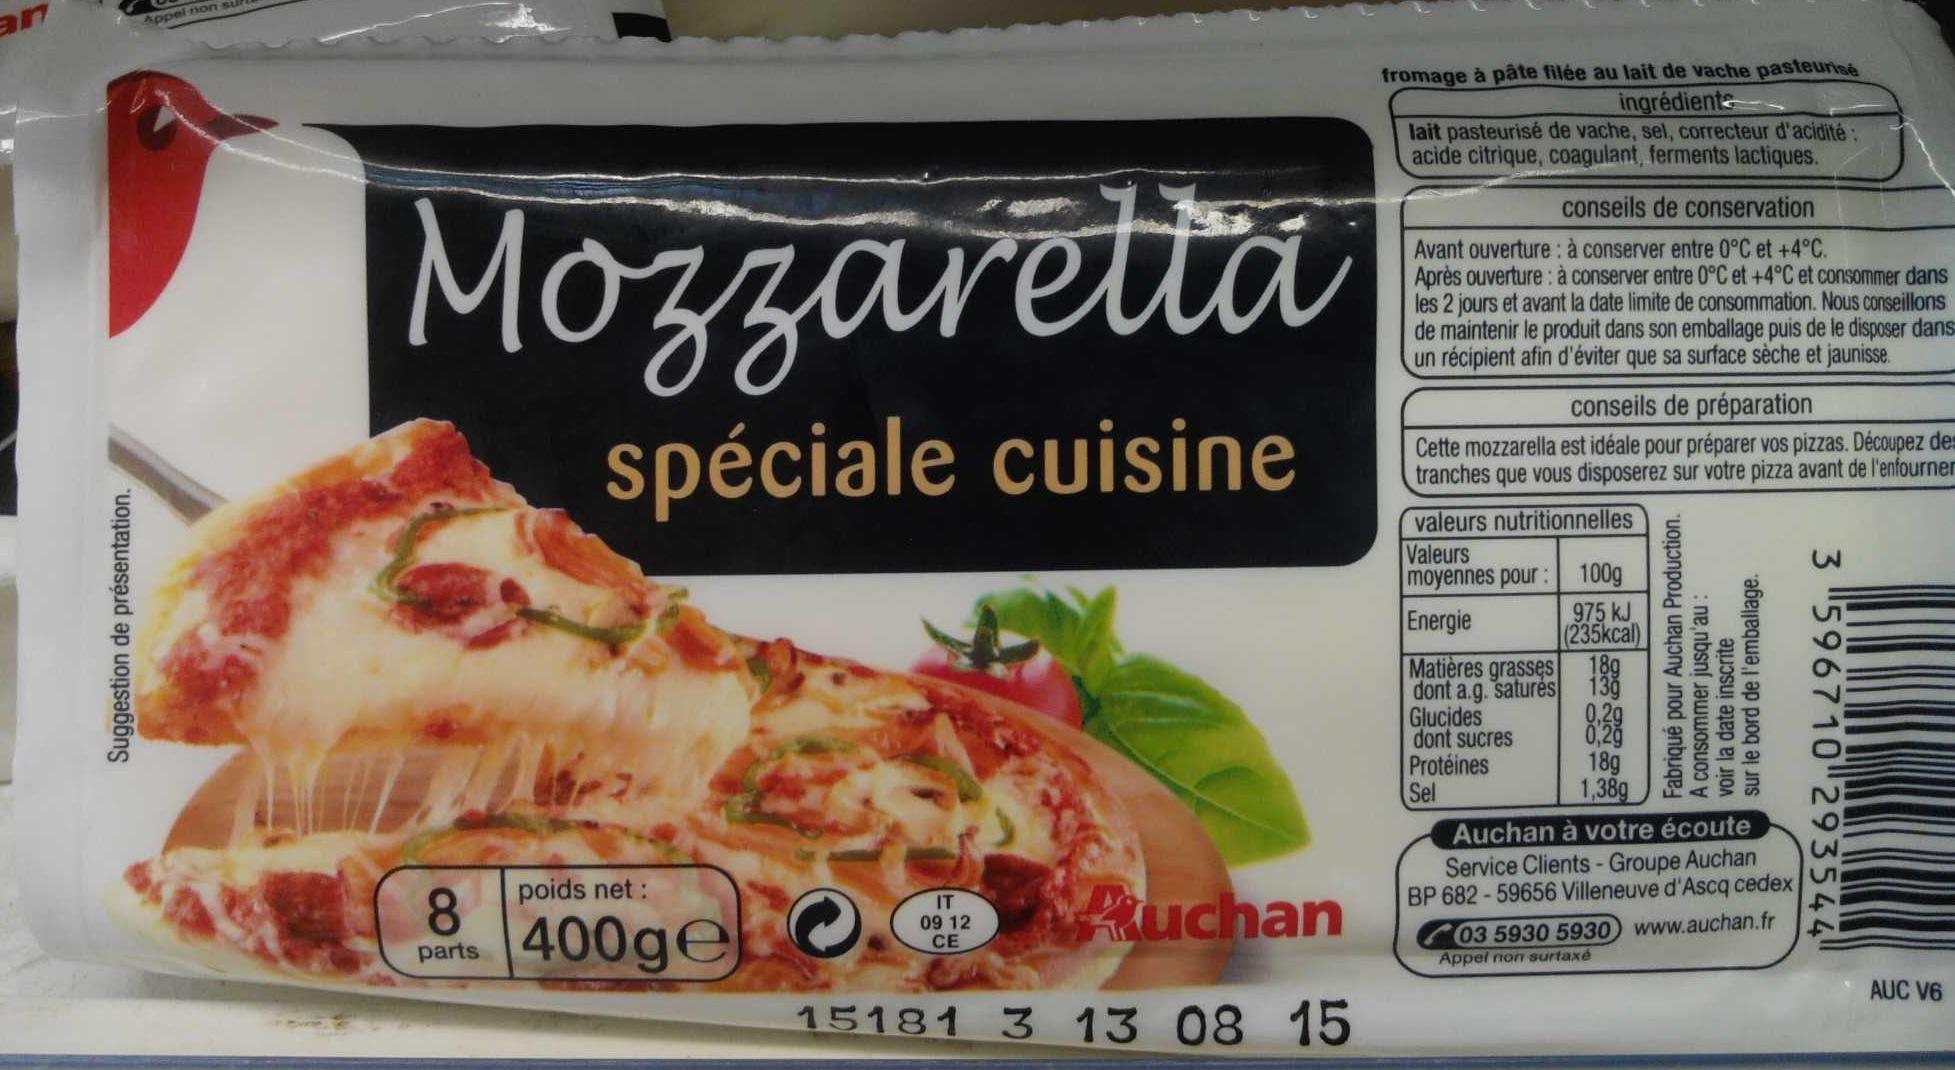 mozzarella sp ciale cuisine 18 mg auchan 400 g. Black Bedroom Furniture Sets. Home Design Ideas